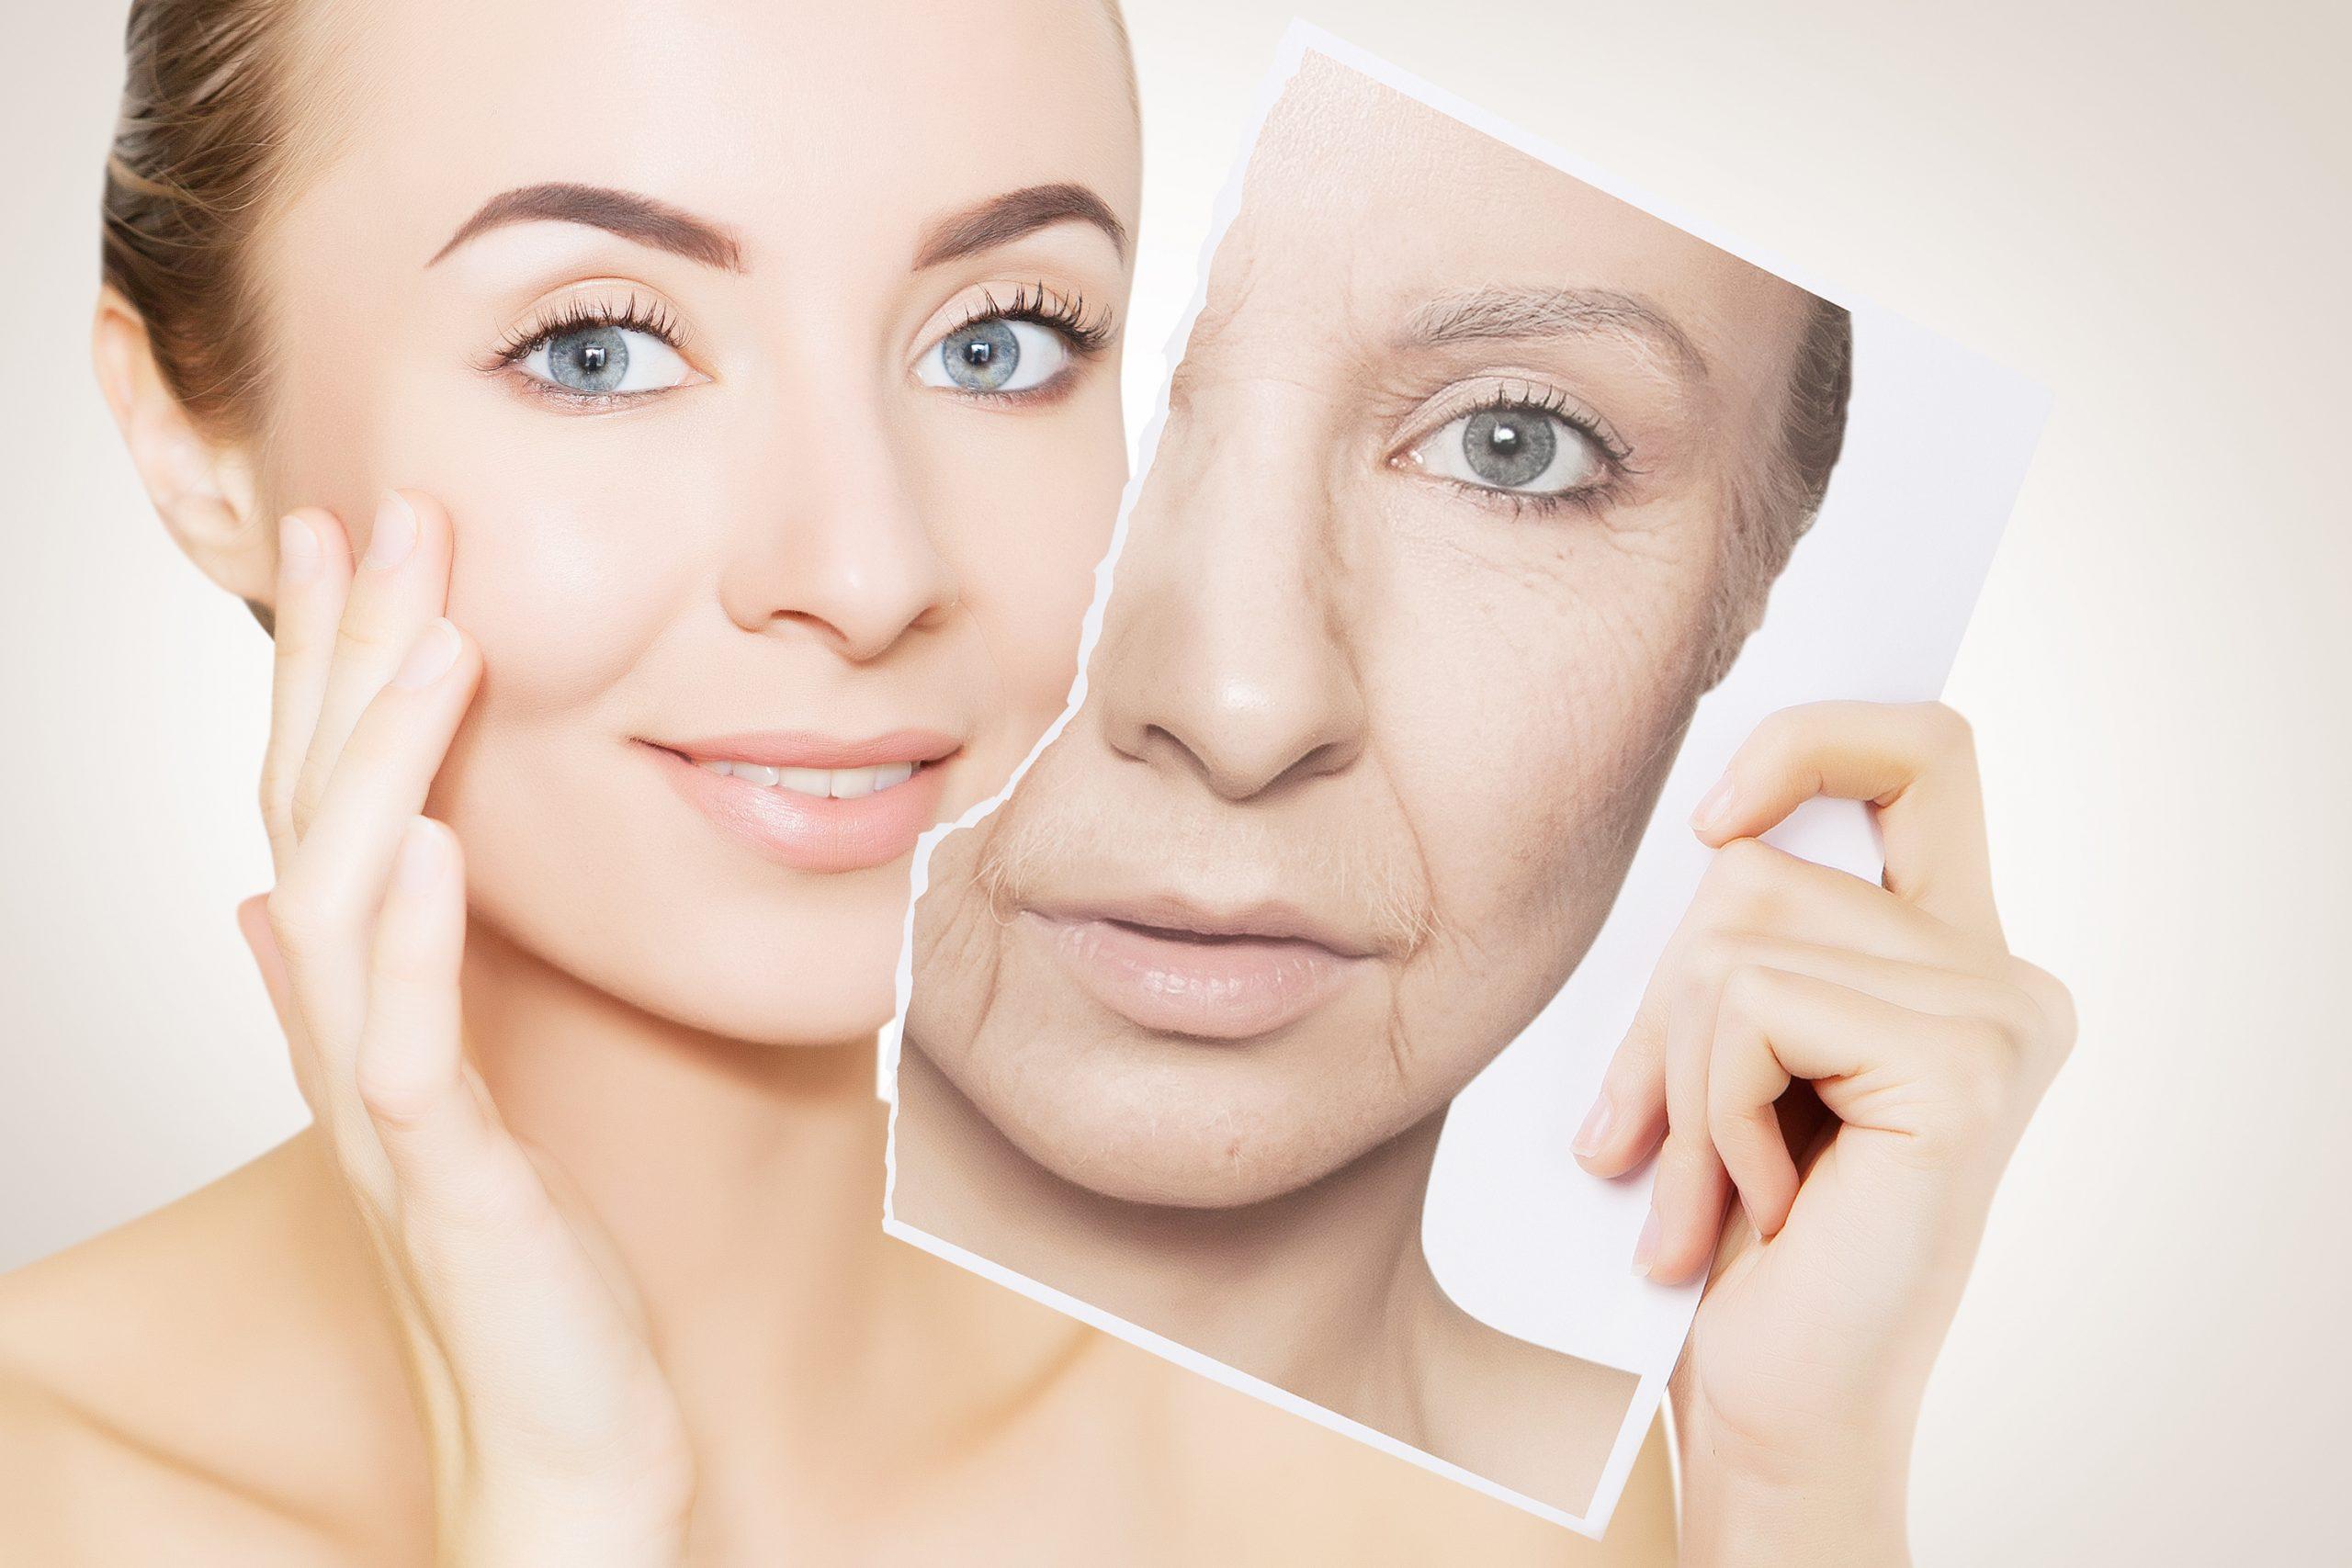 9 Best Anti-Aging Treatments 2021